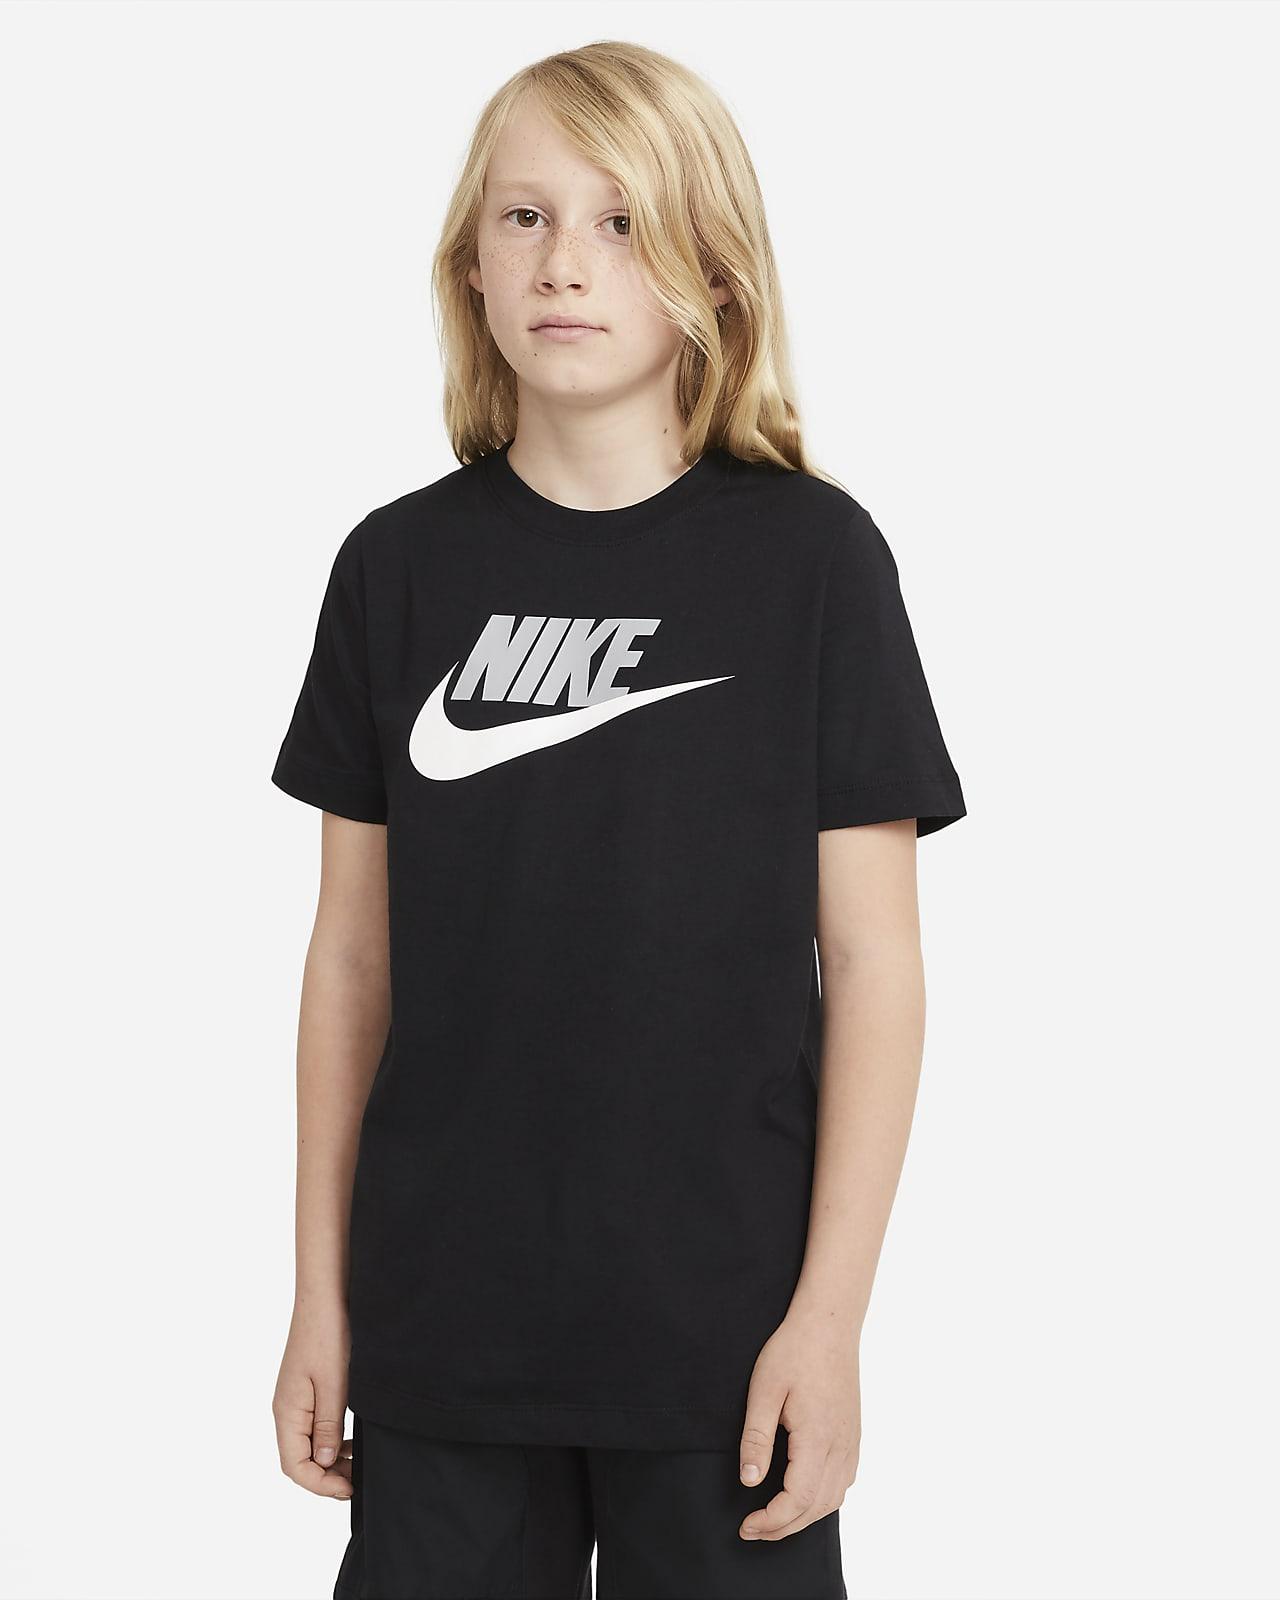 Nike Sportswear Older Kids' Cotton T-Shirt